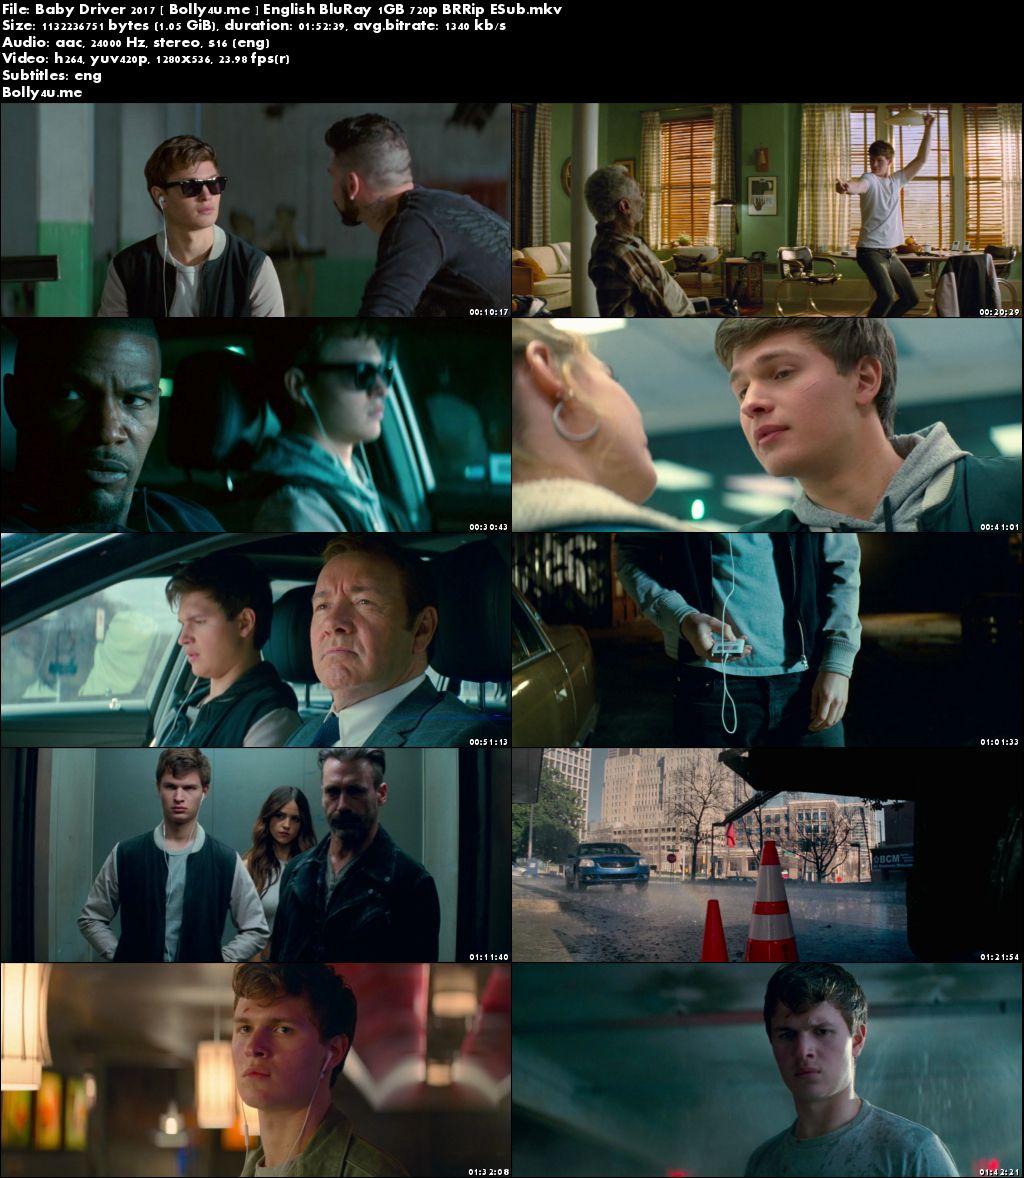 Baby Driver 2017 BluRay 1GB Full English Movie Download 720p ESub